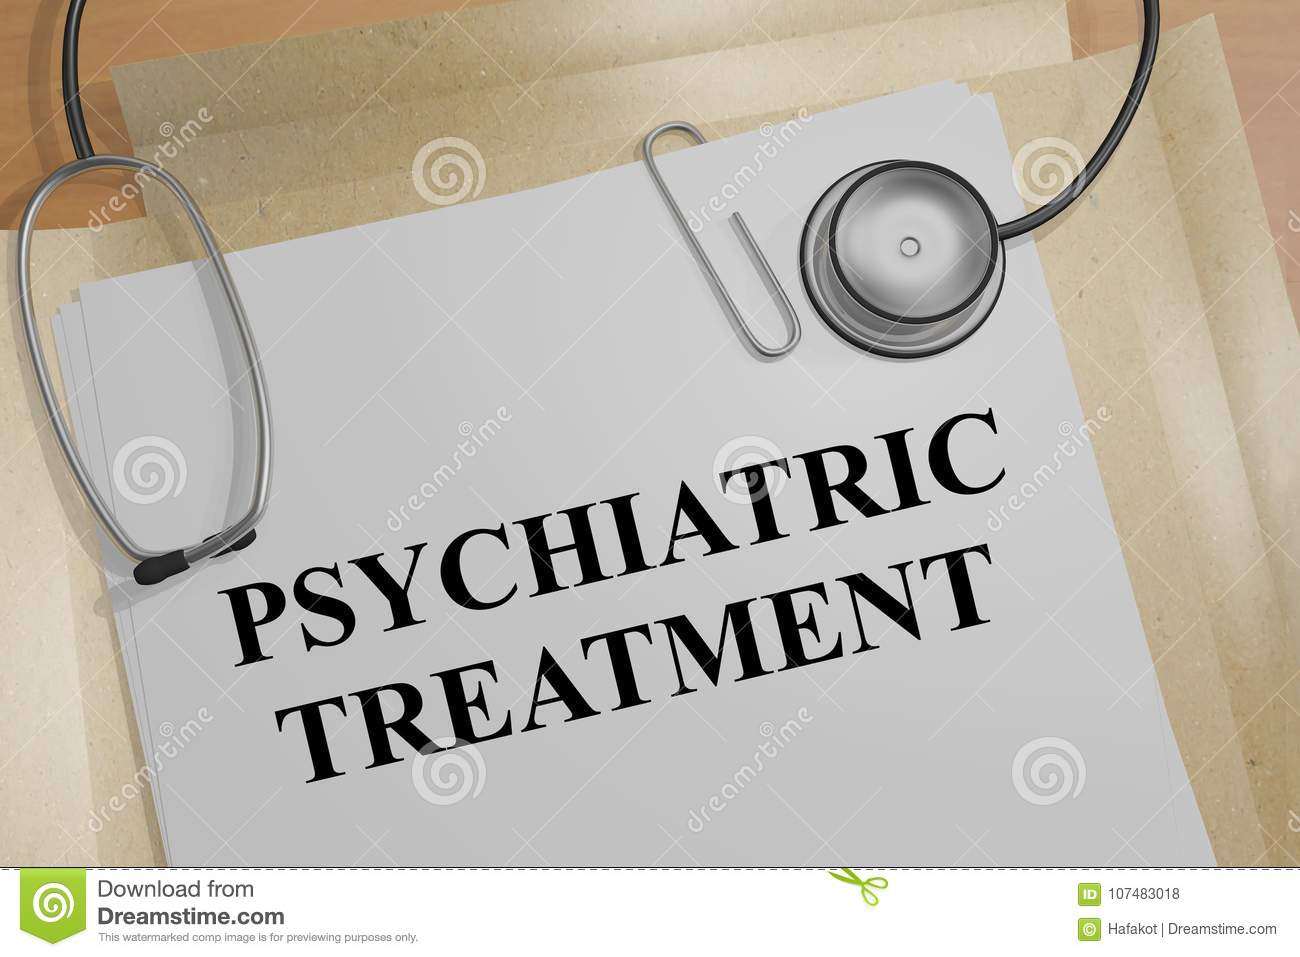 NEW LIFE HOSPITAL, REHABILITATION & DE ADDICTION CENTER, Psychiatrist pune, psychiatrist in pune, psychiatrist in koregaonpark, best psychiatrist in pune, top psychiatrist in pune, top 5 psychiatry in pune, psychiatry doctors in pune, psychiatrist